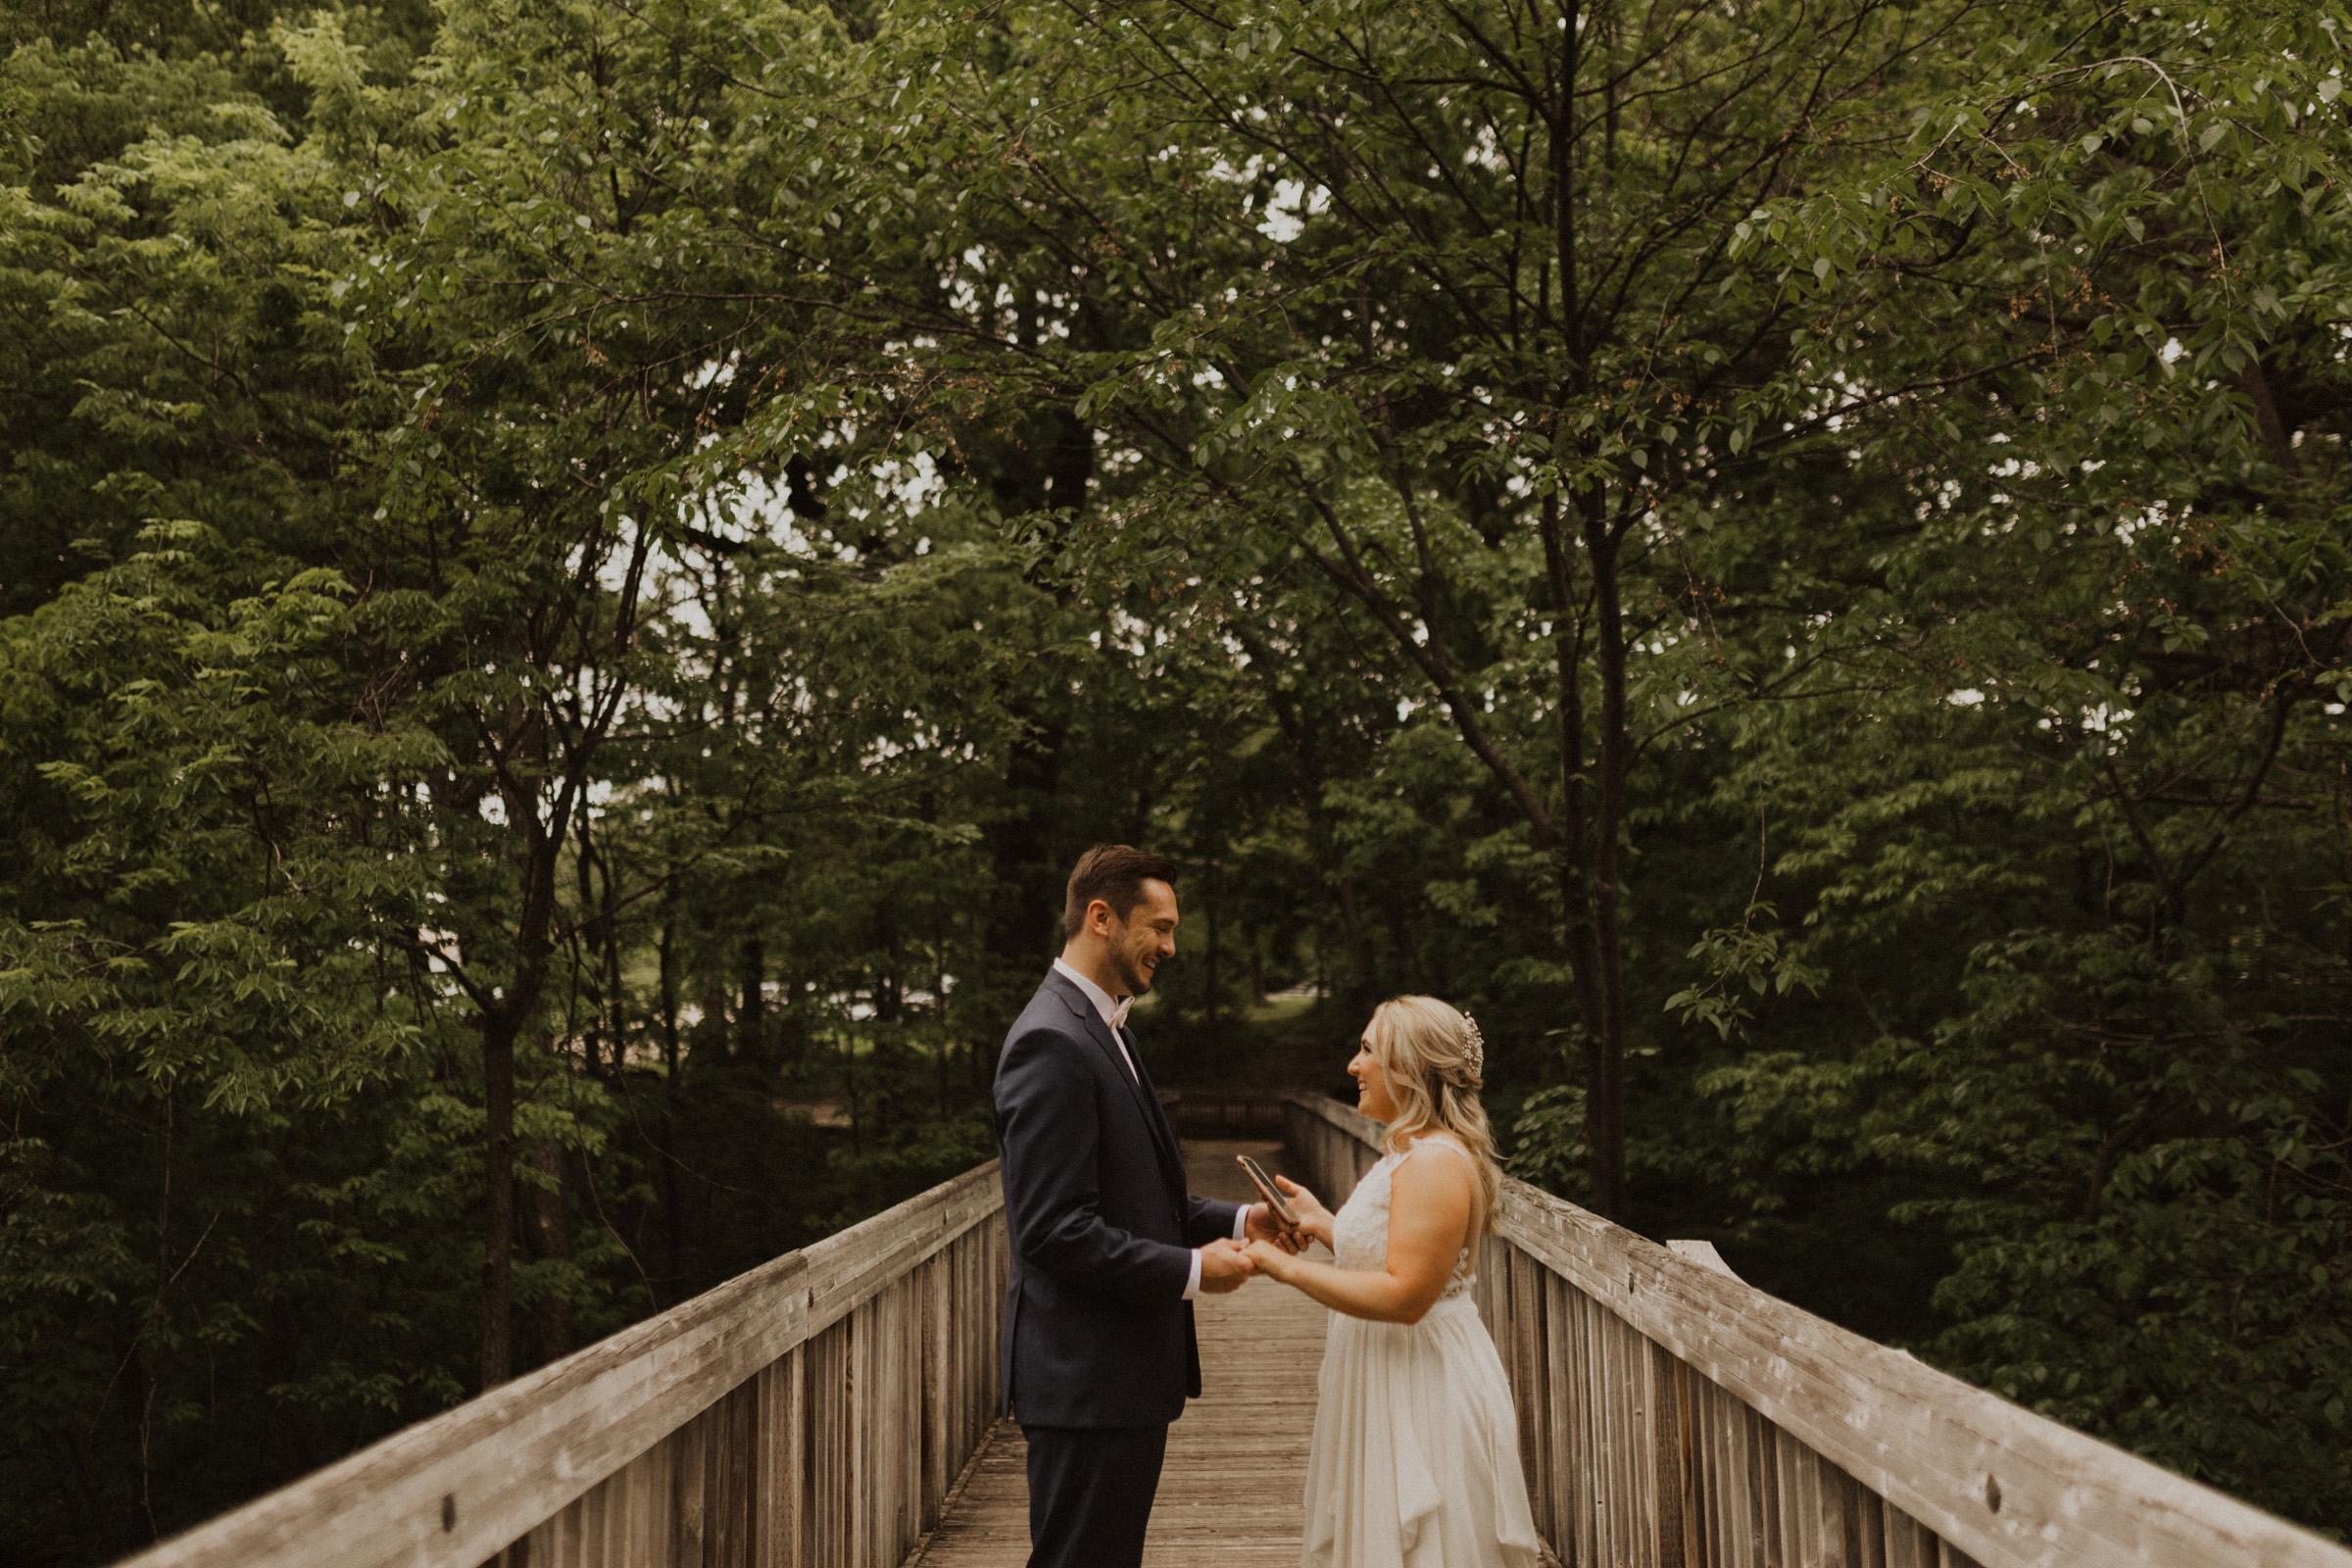 alyssa barletter photography nelson wedding nebraska city lied lodge morton barn spring wedding photographer-8.jpg